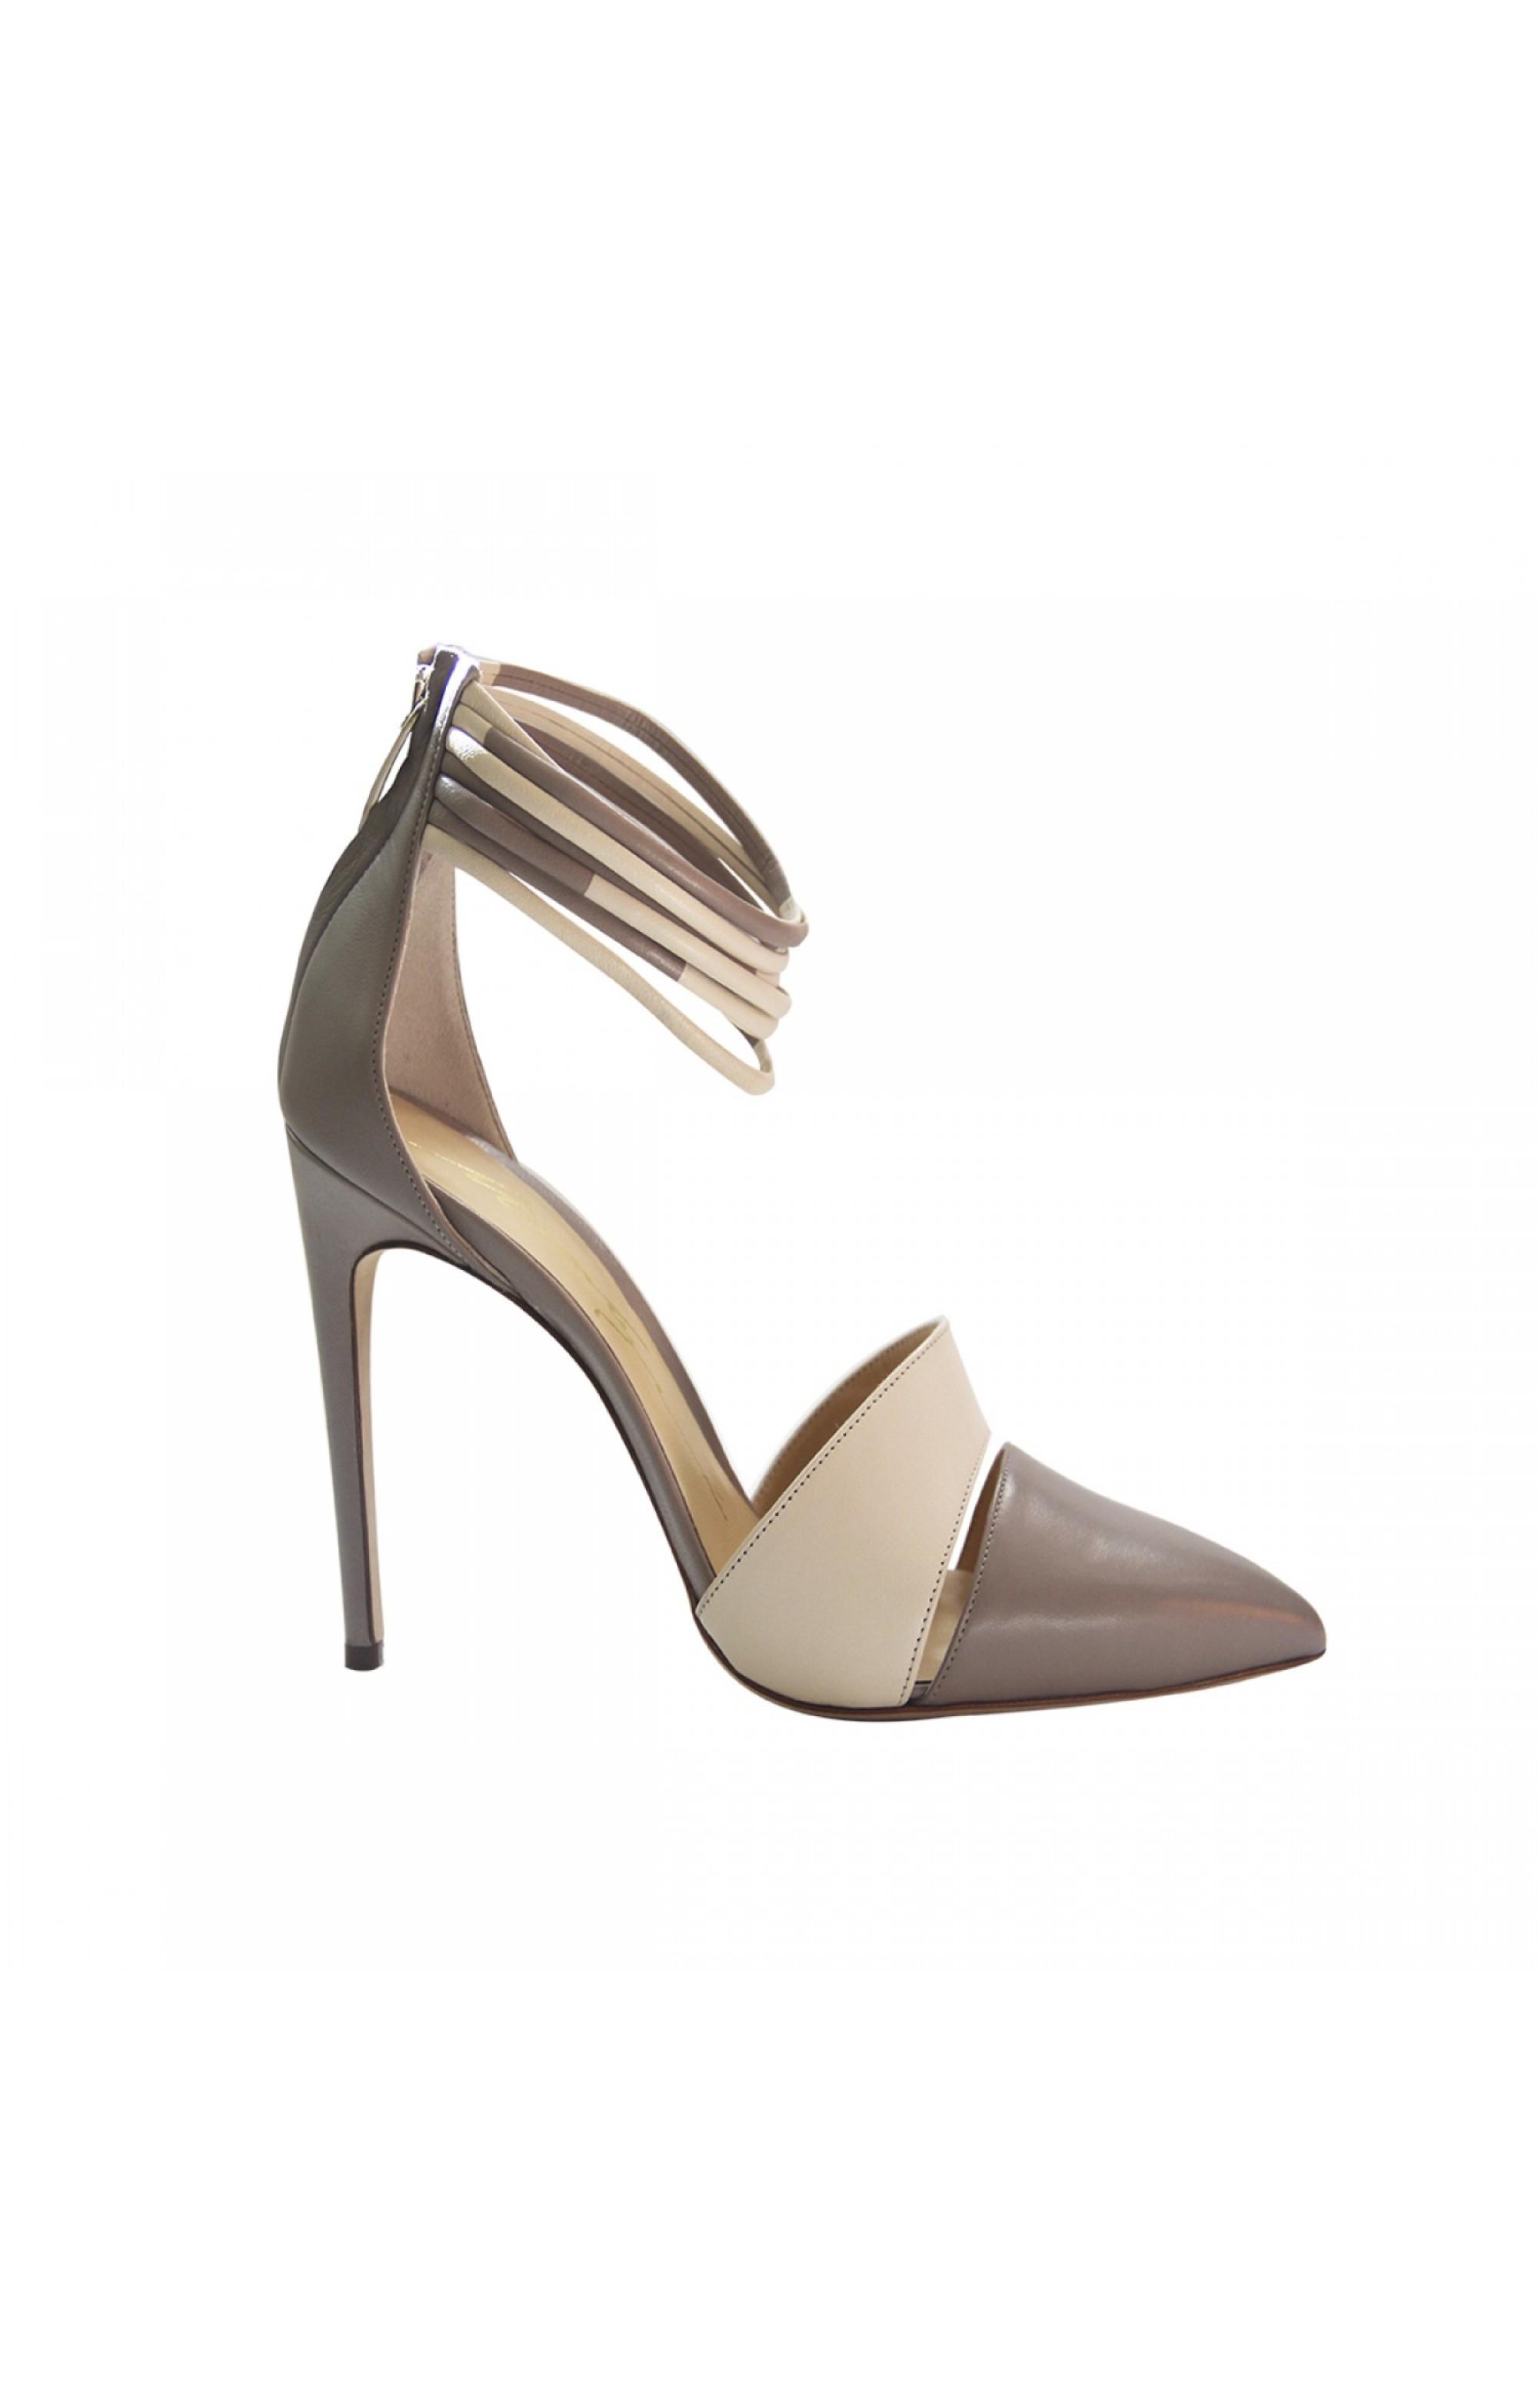 Merlyn Leder High Heels NAPPA TAUPE / Beige